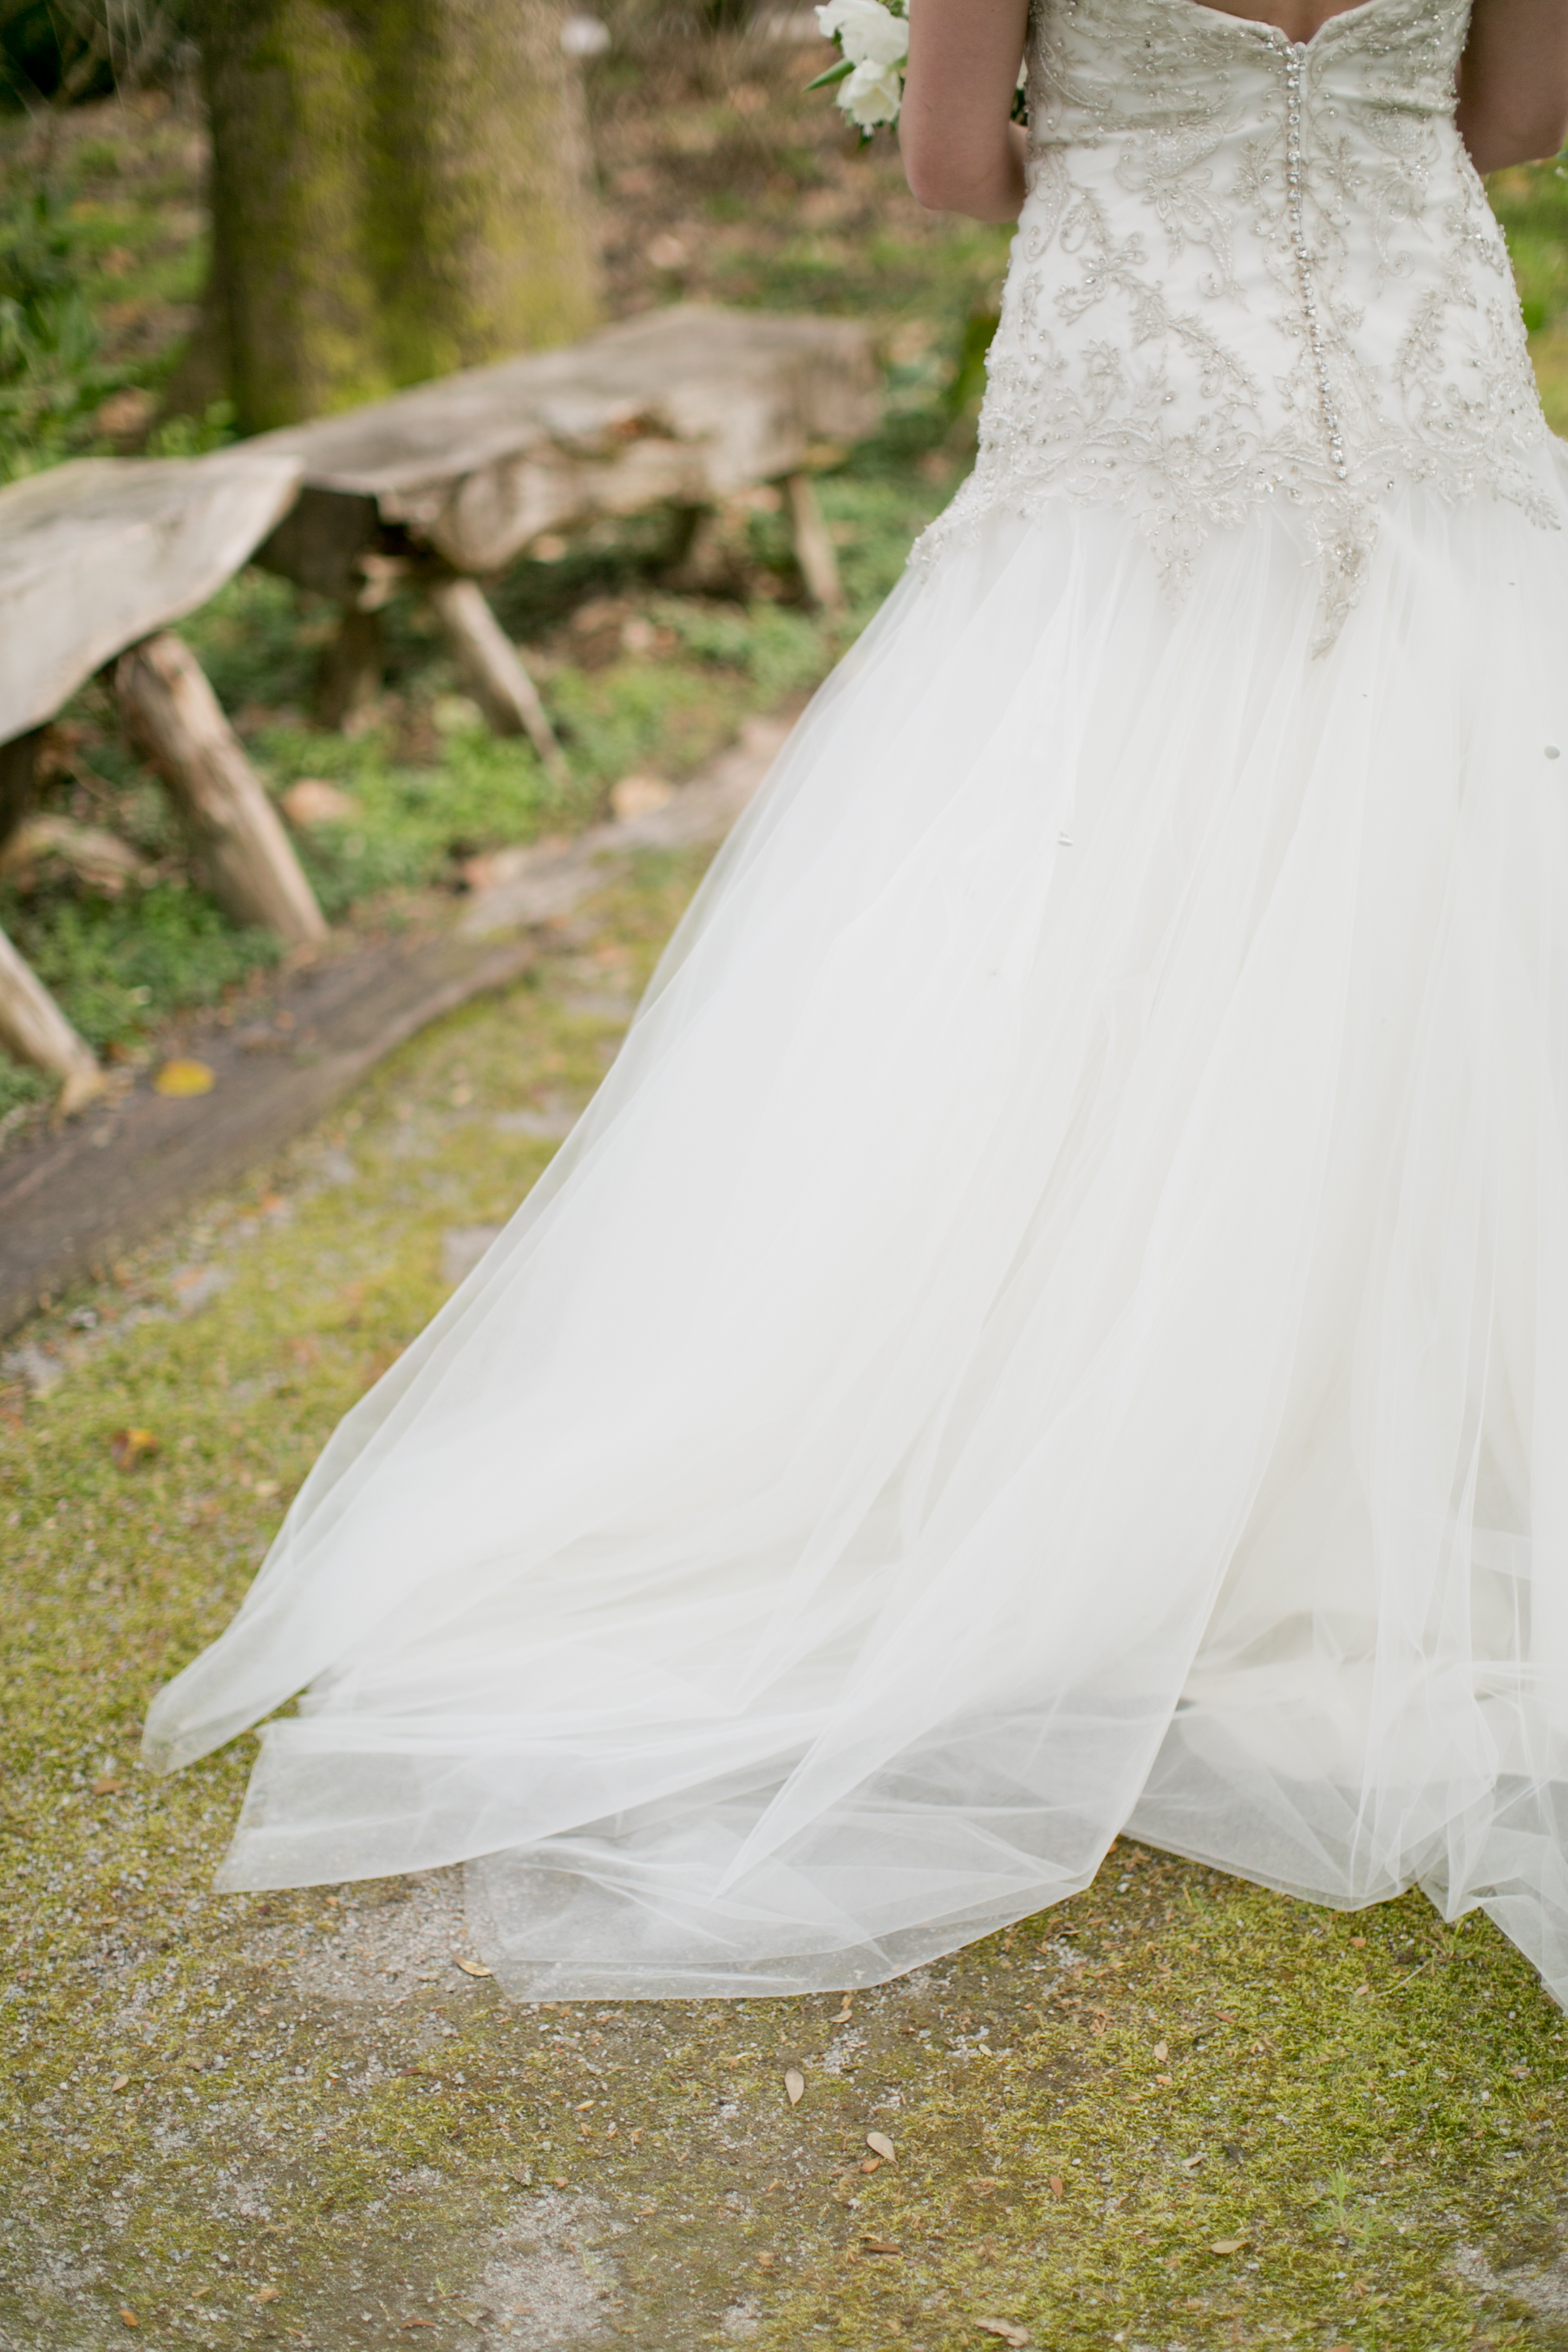 wavering_place_wedding09.jpg